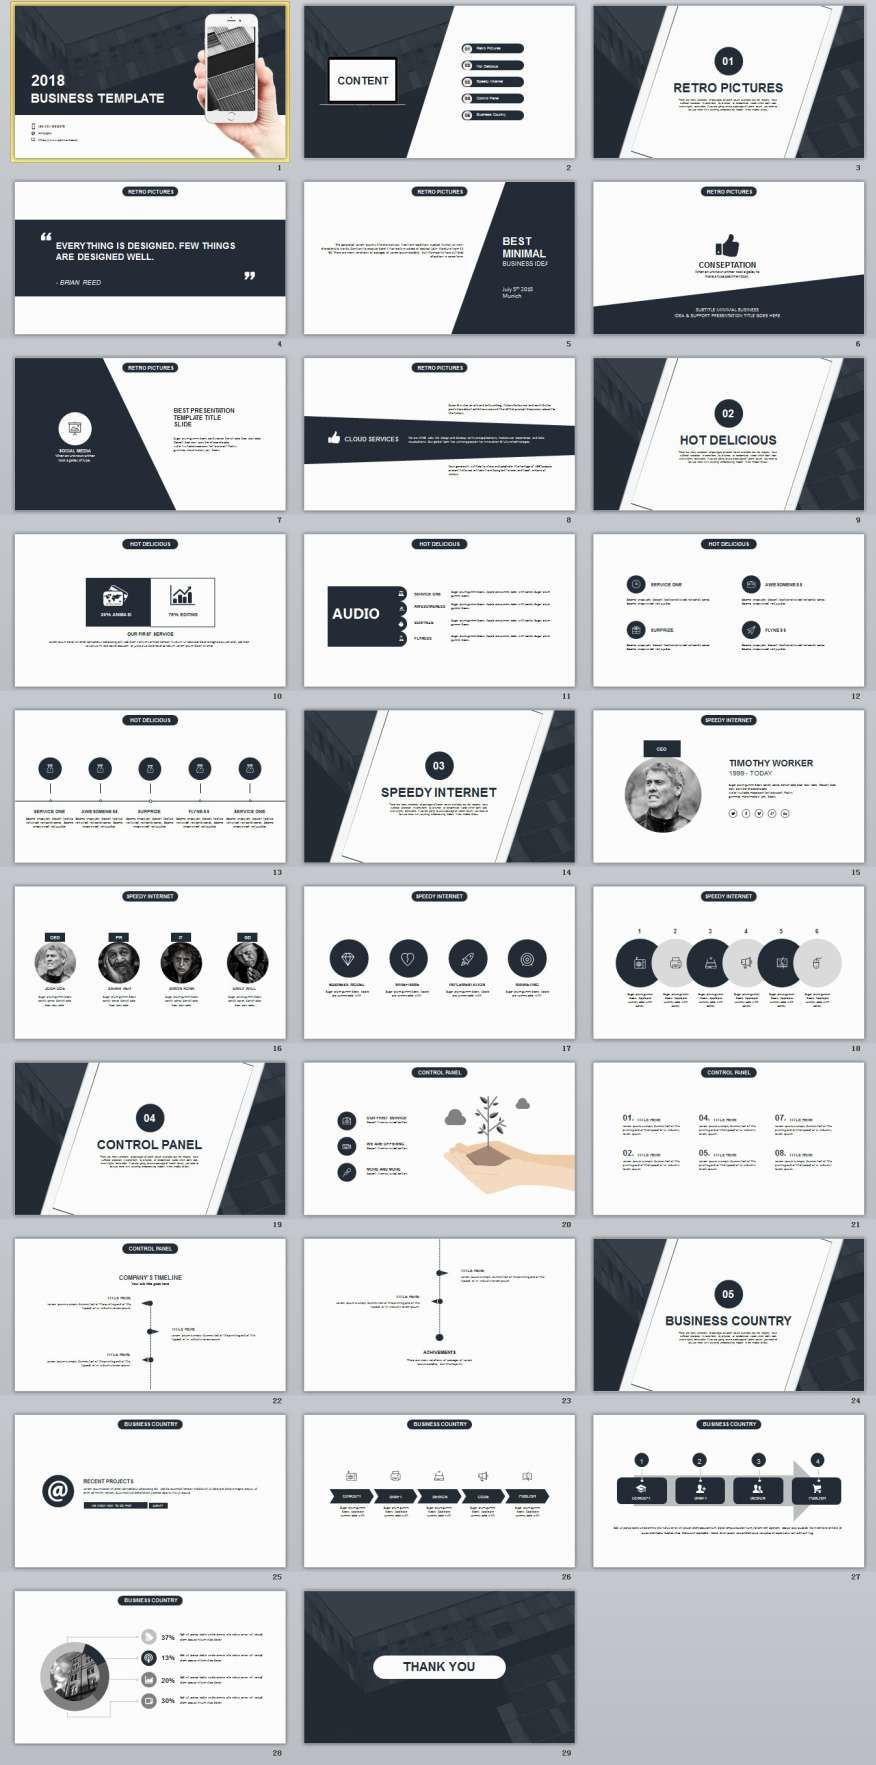 29 black business plan presentation powerpoint templates 2018 29 black business plan presentation powerpoint templates toneelgroepblik Choice Image